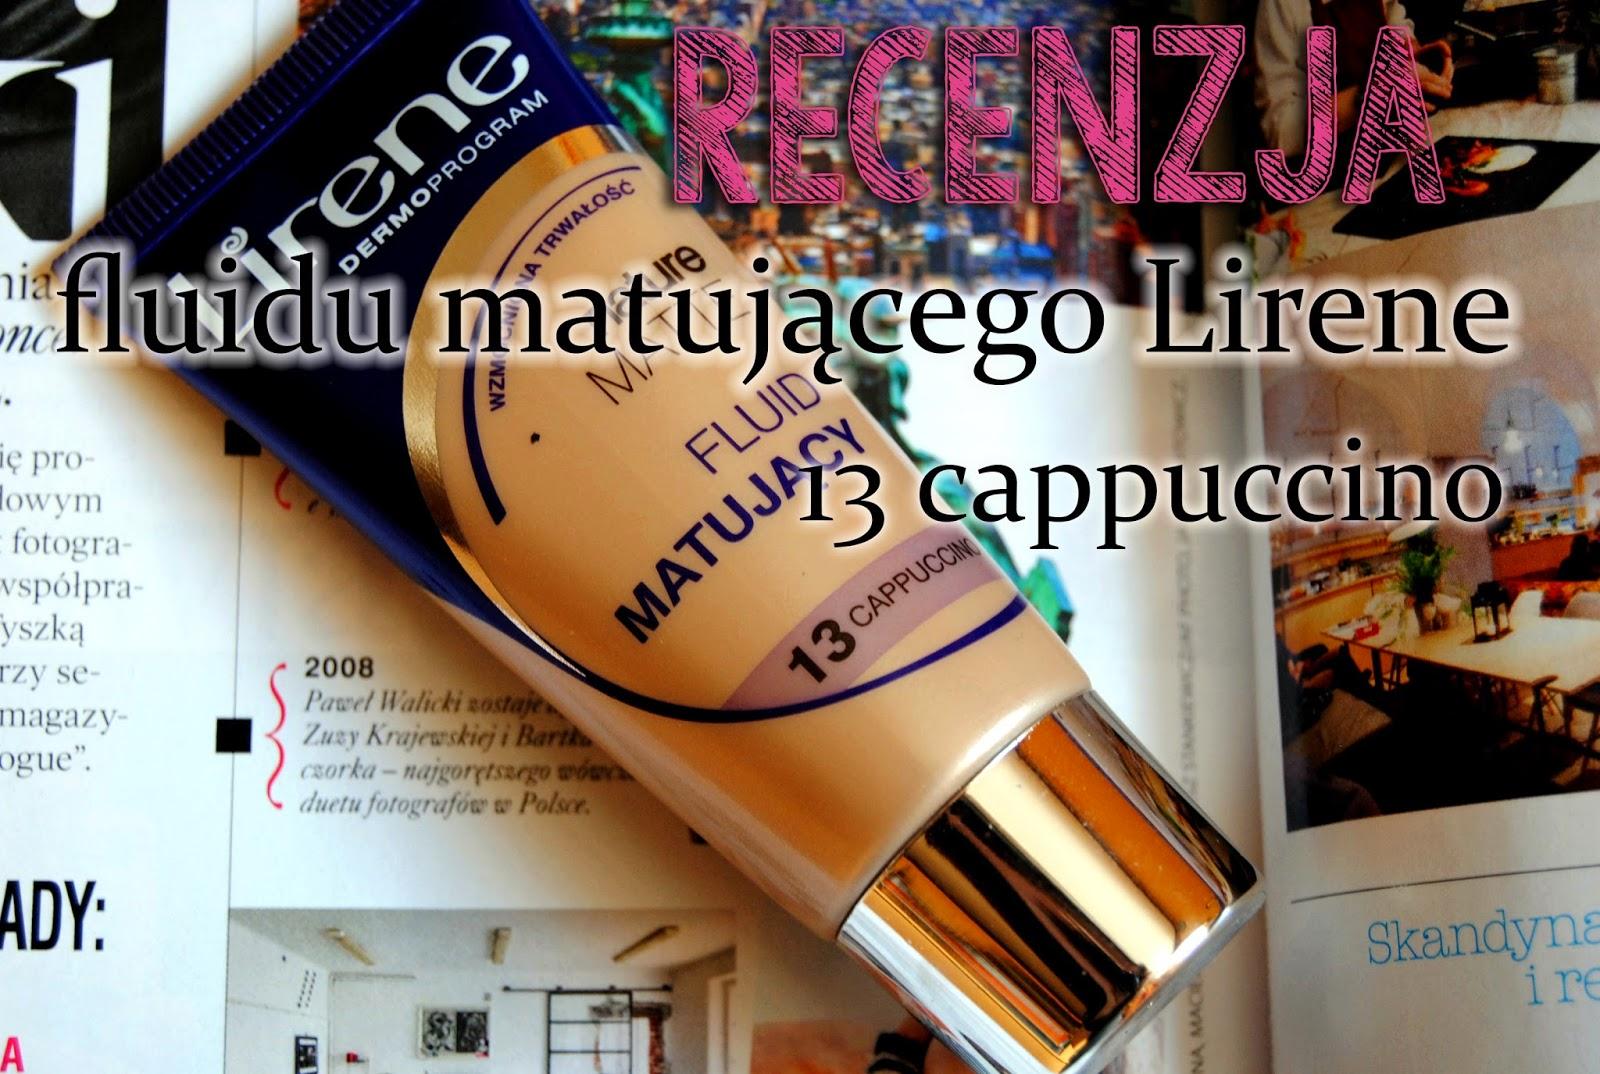 Lirene, fluid matujacy, 13 Cappuccino - recenzja